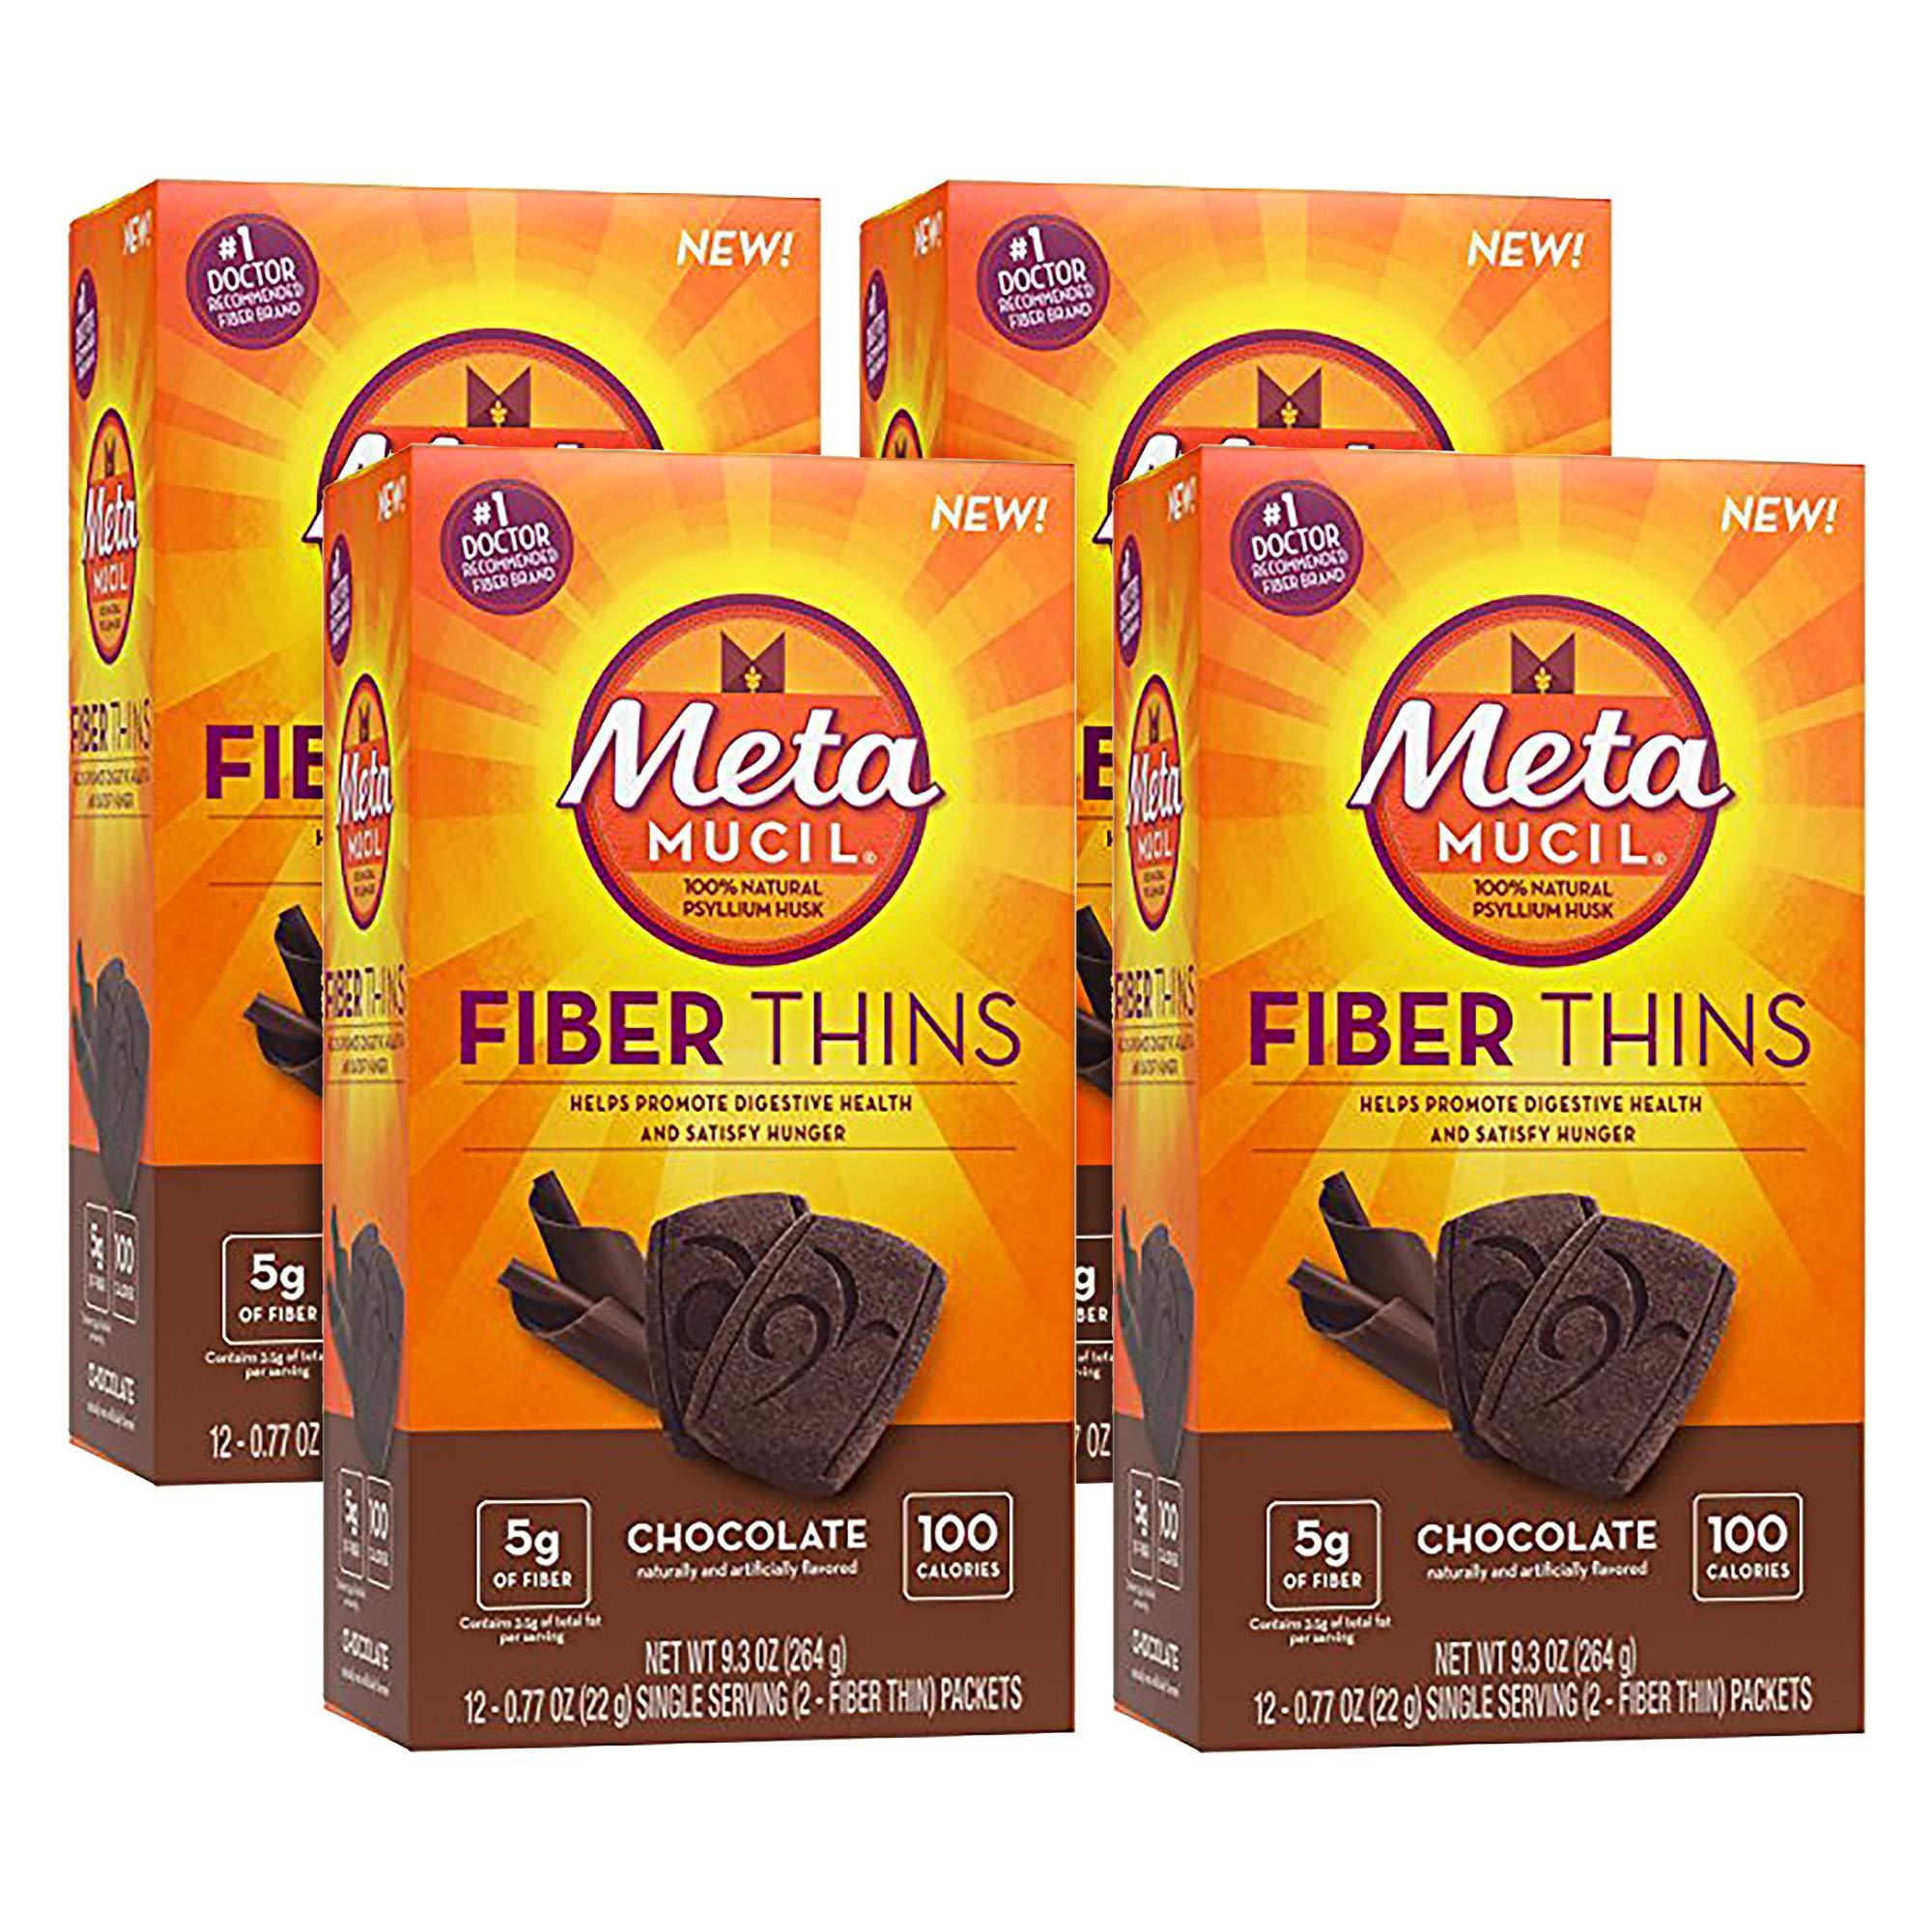 Metamucil Chocolate Flavored Fiber Thins Dietary Fiber Supplement with Psyllium Husk, 12 servings (pack of 4) by Metamucil (Image #1)